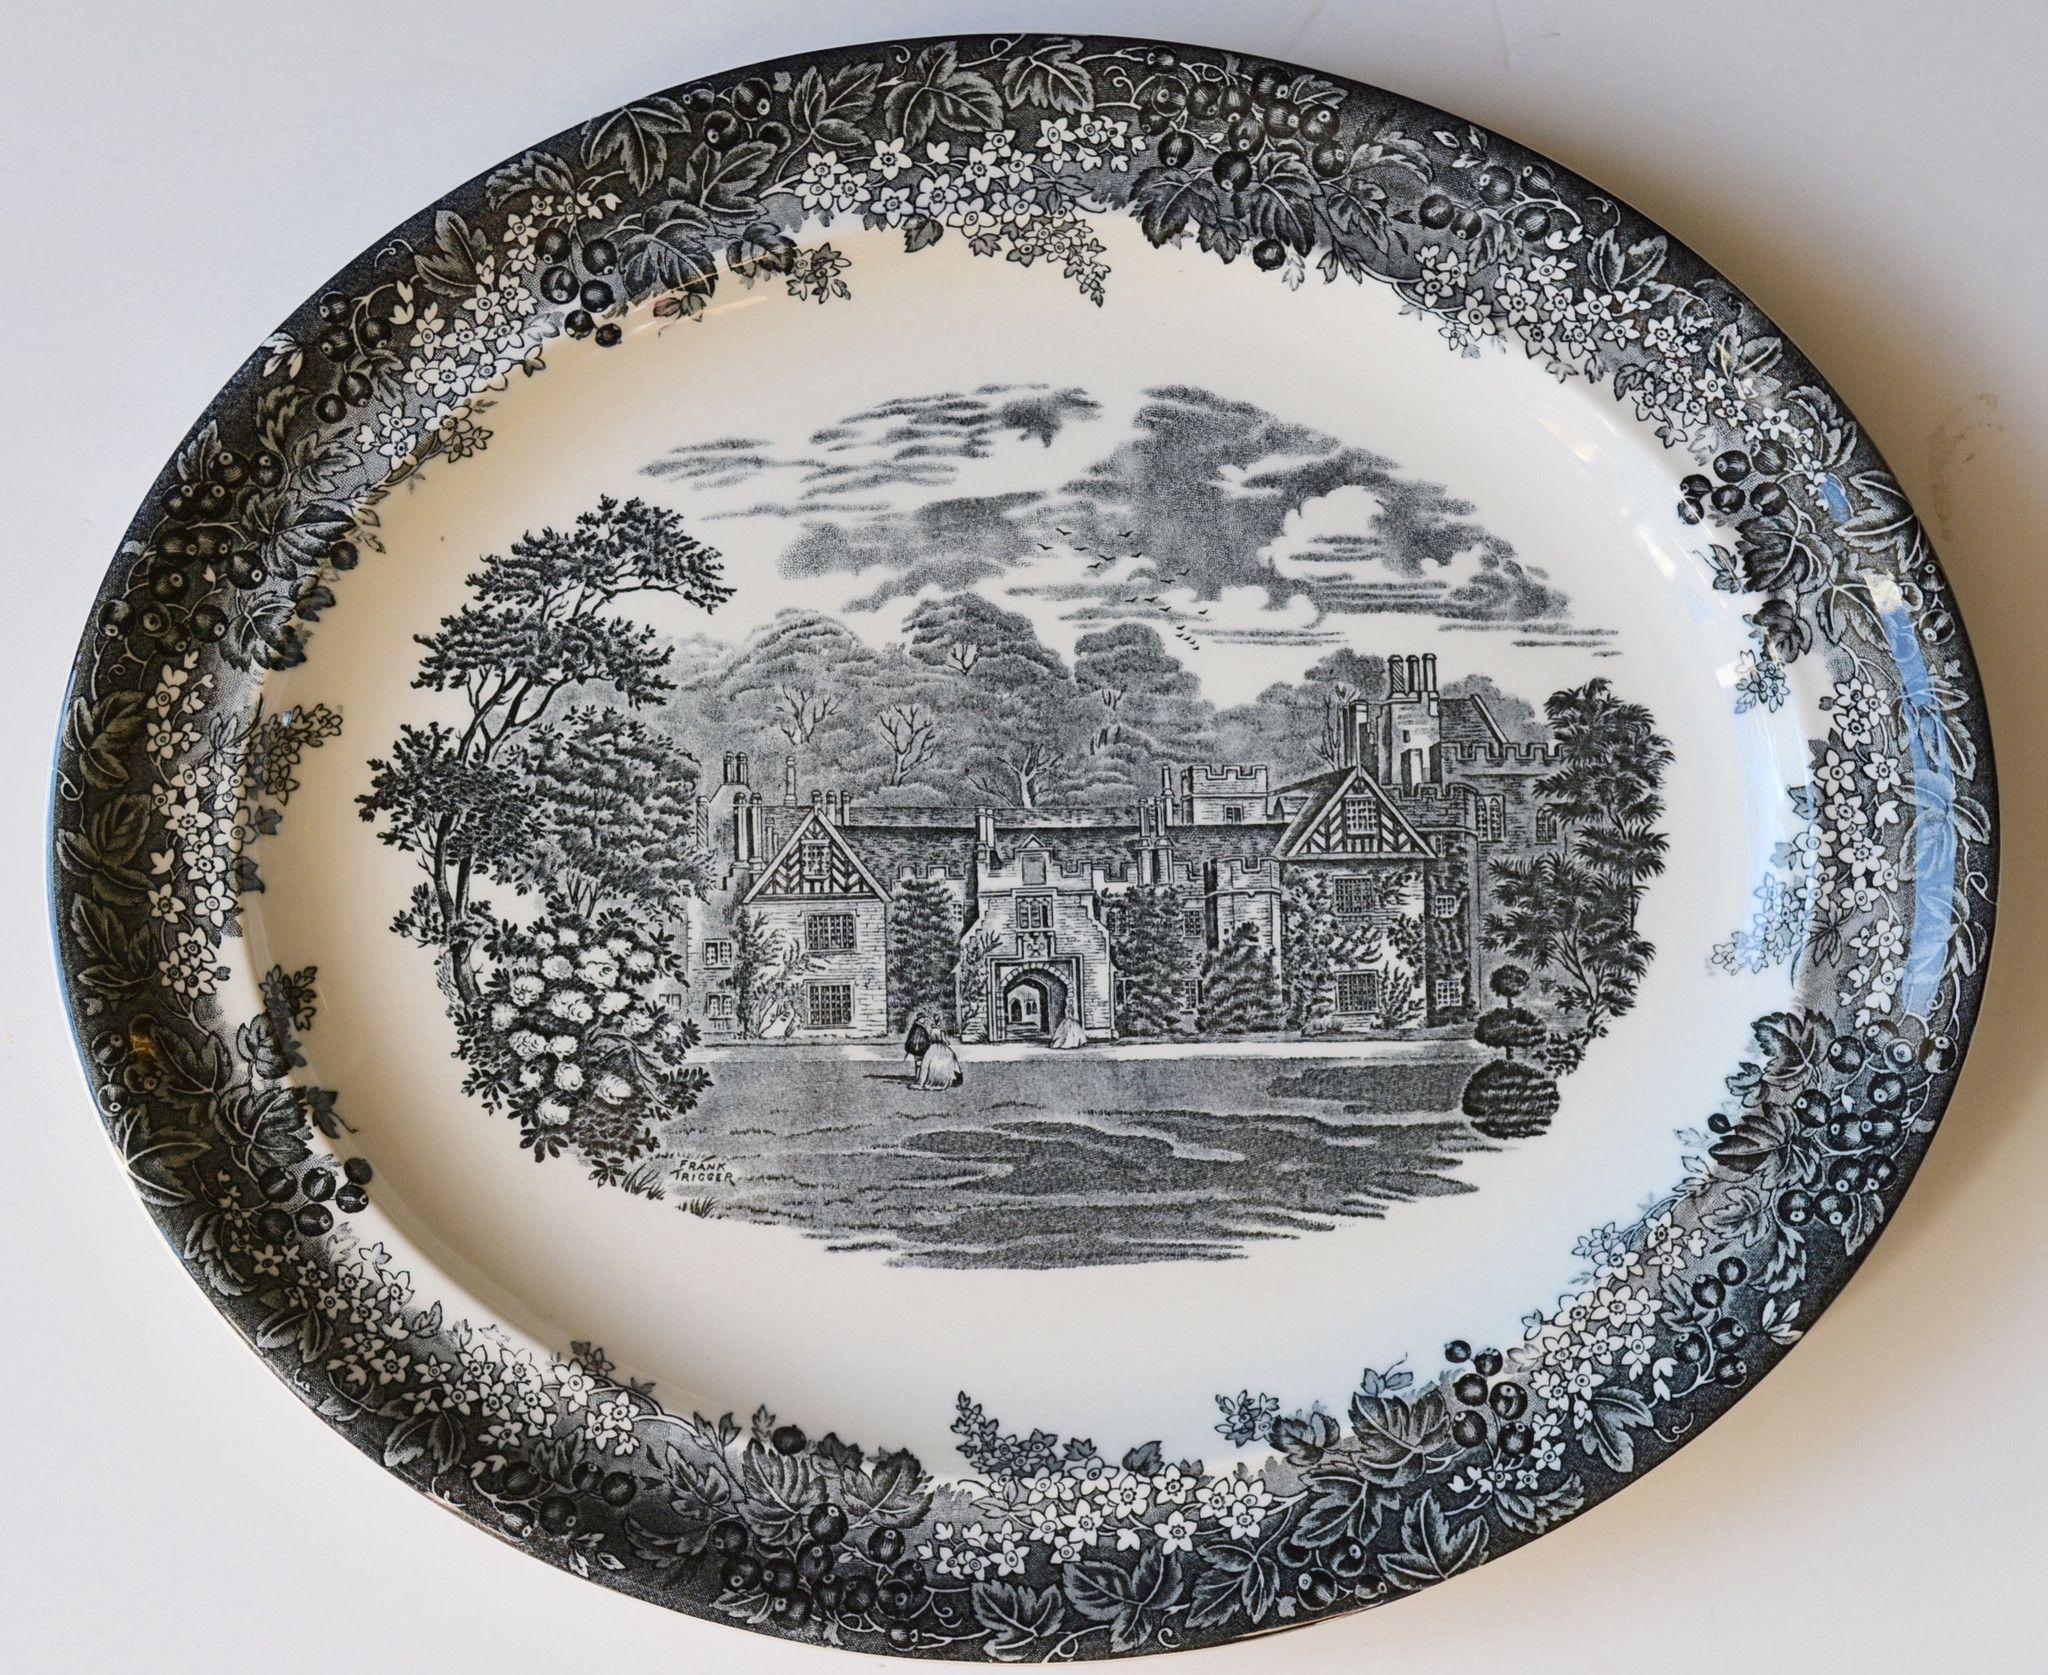 Wedgwood English Black Toile Transferware Platter Country Manor House Flowers Berries